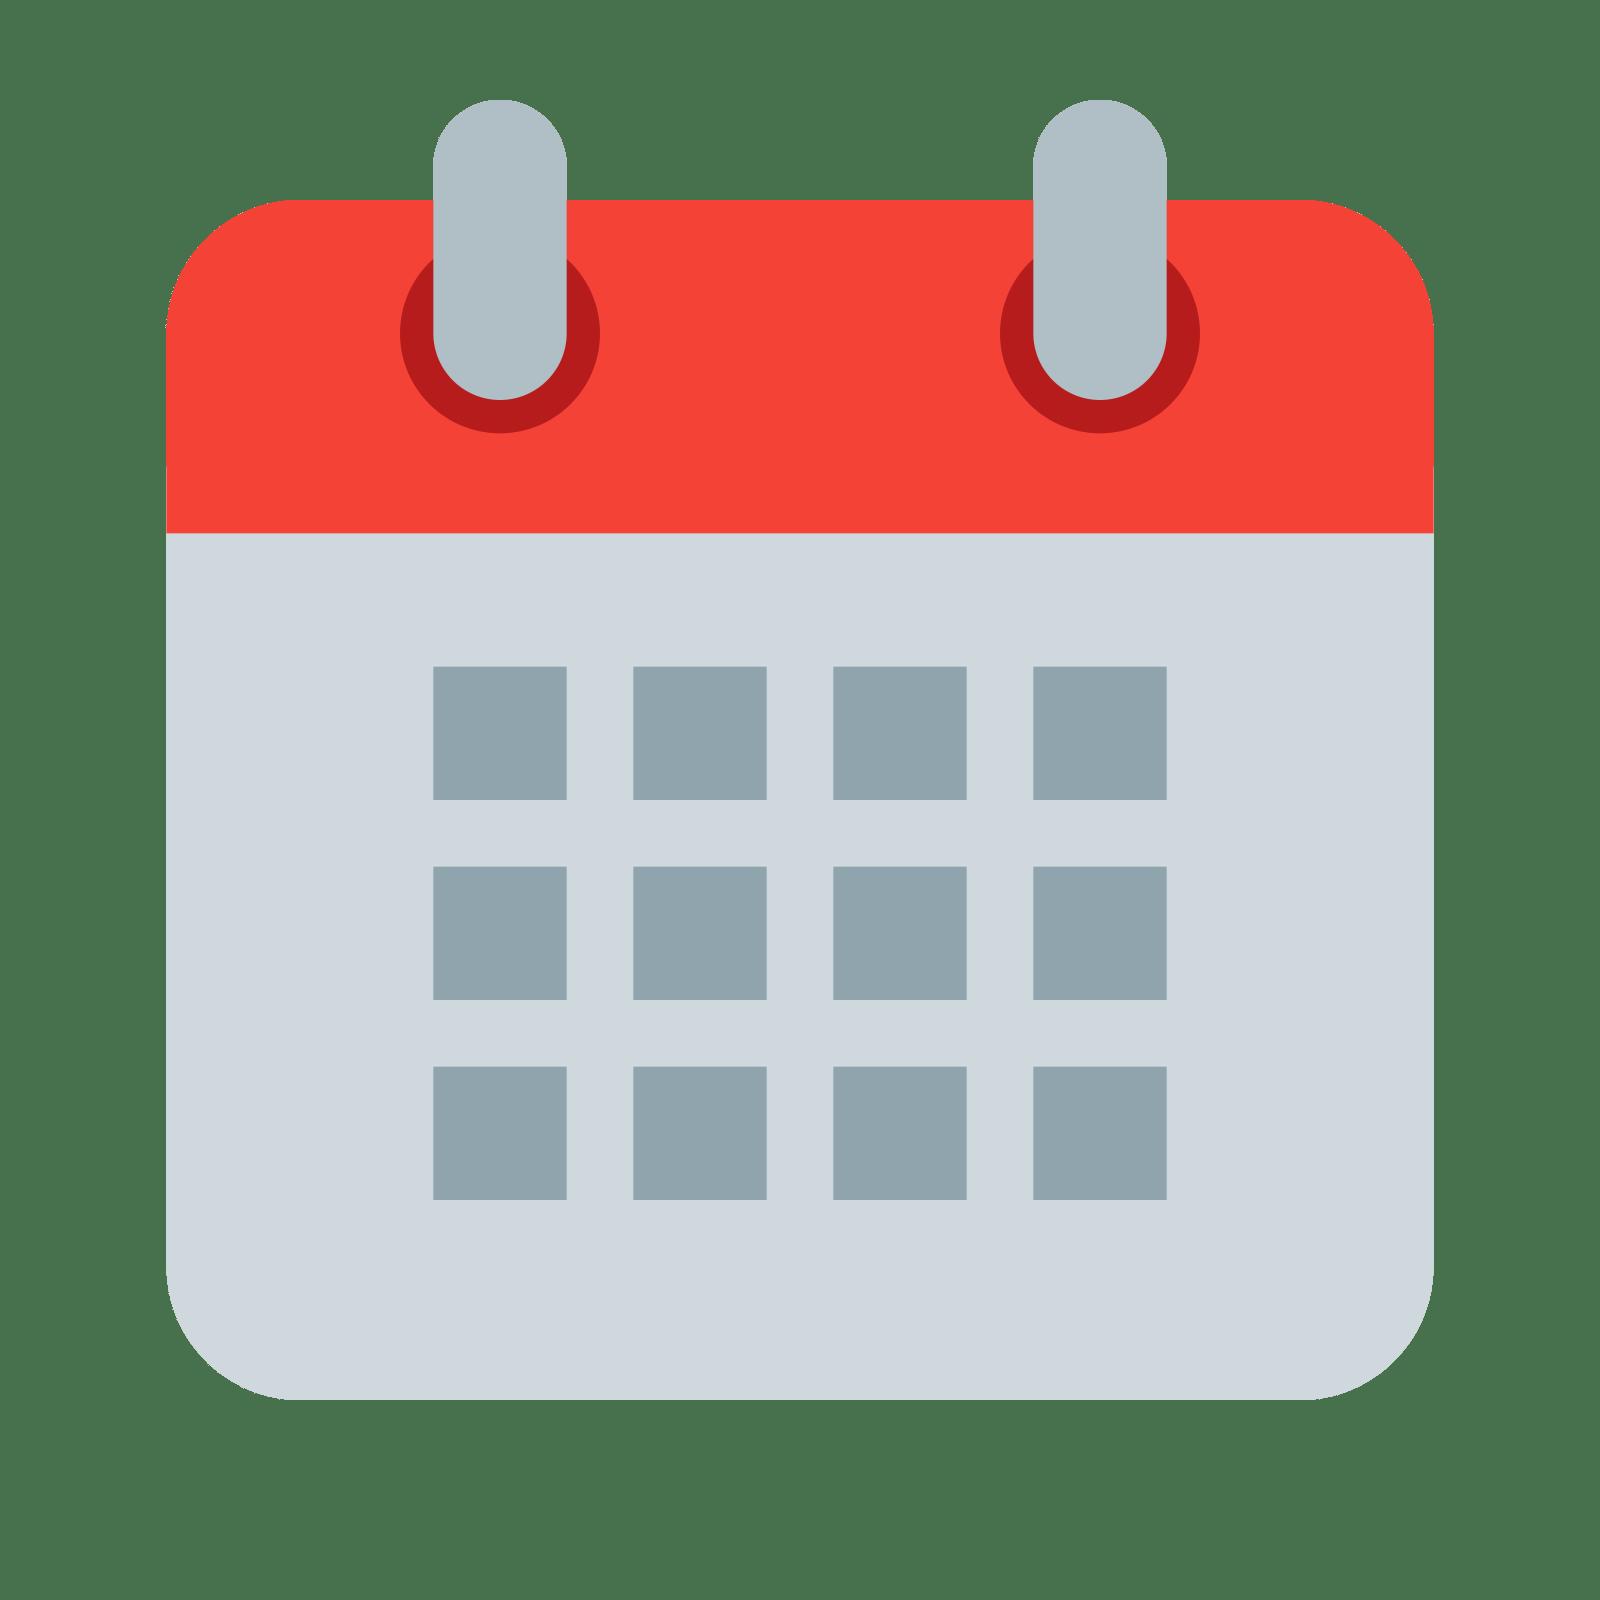 Free blank printable calendar. Schedule clipart clander